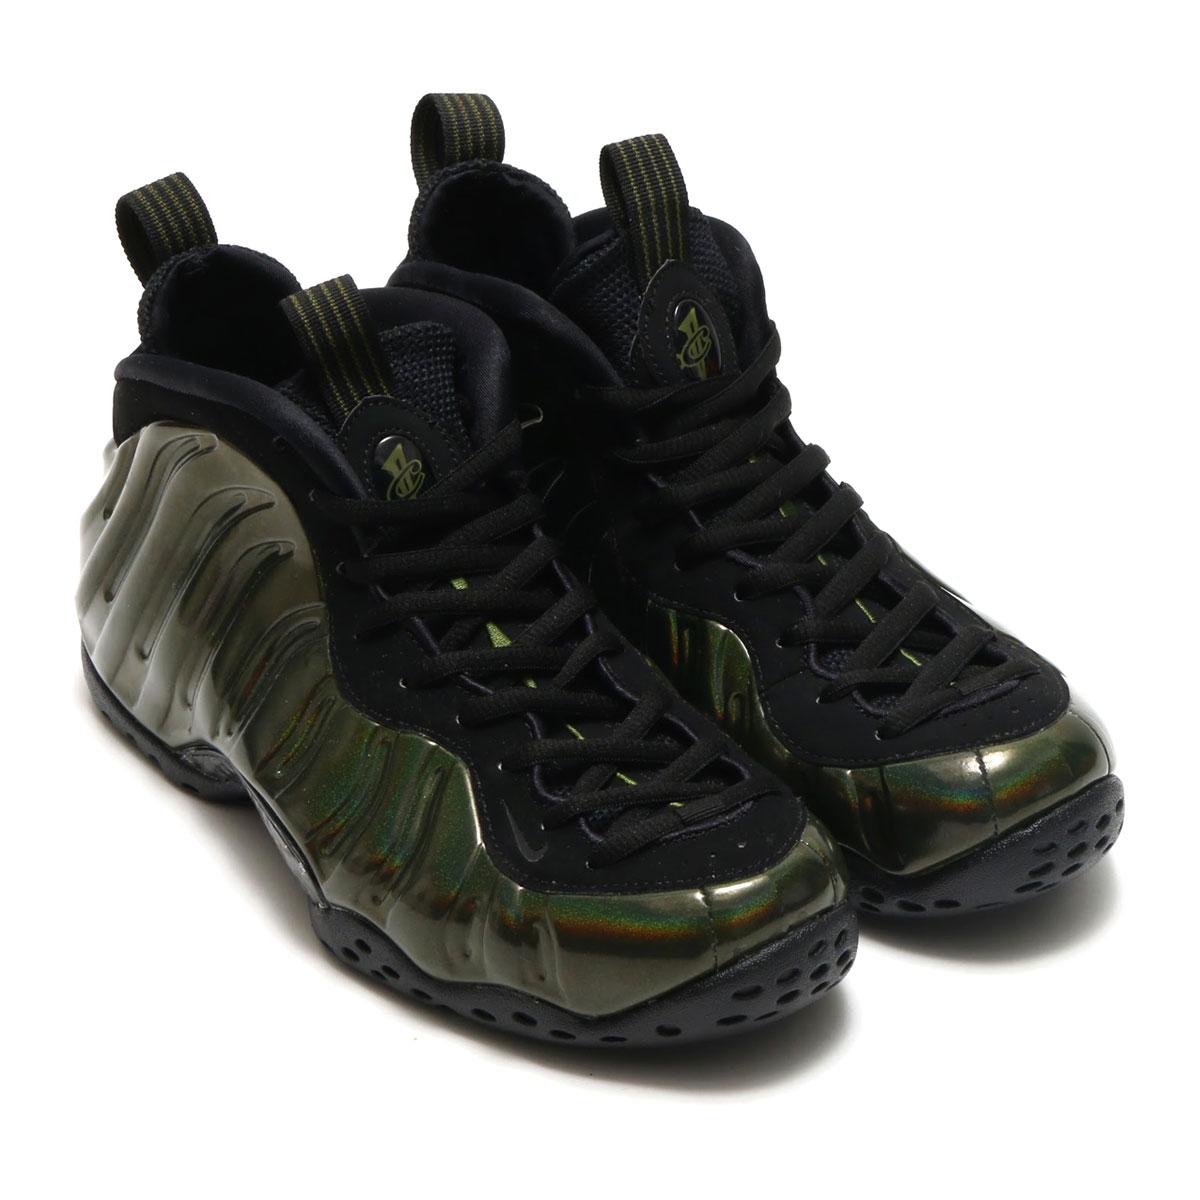 NIKE AIR FOAMPOSITE ONE(ナイキ エア フォームポジット 1)(LEGION GREEN/BLACK-BLACK)